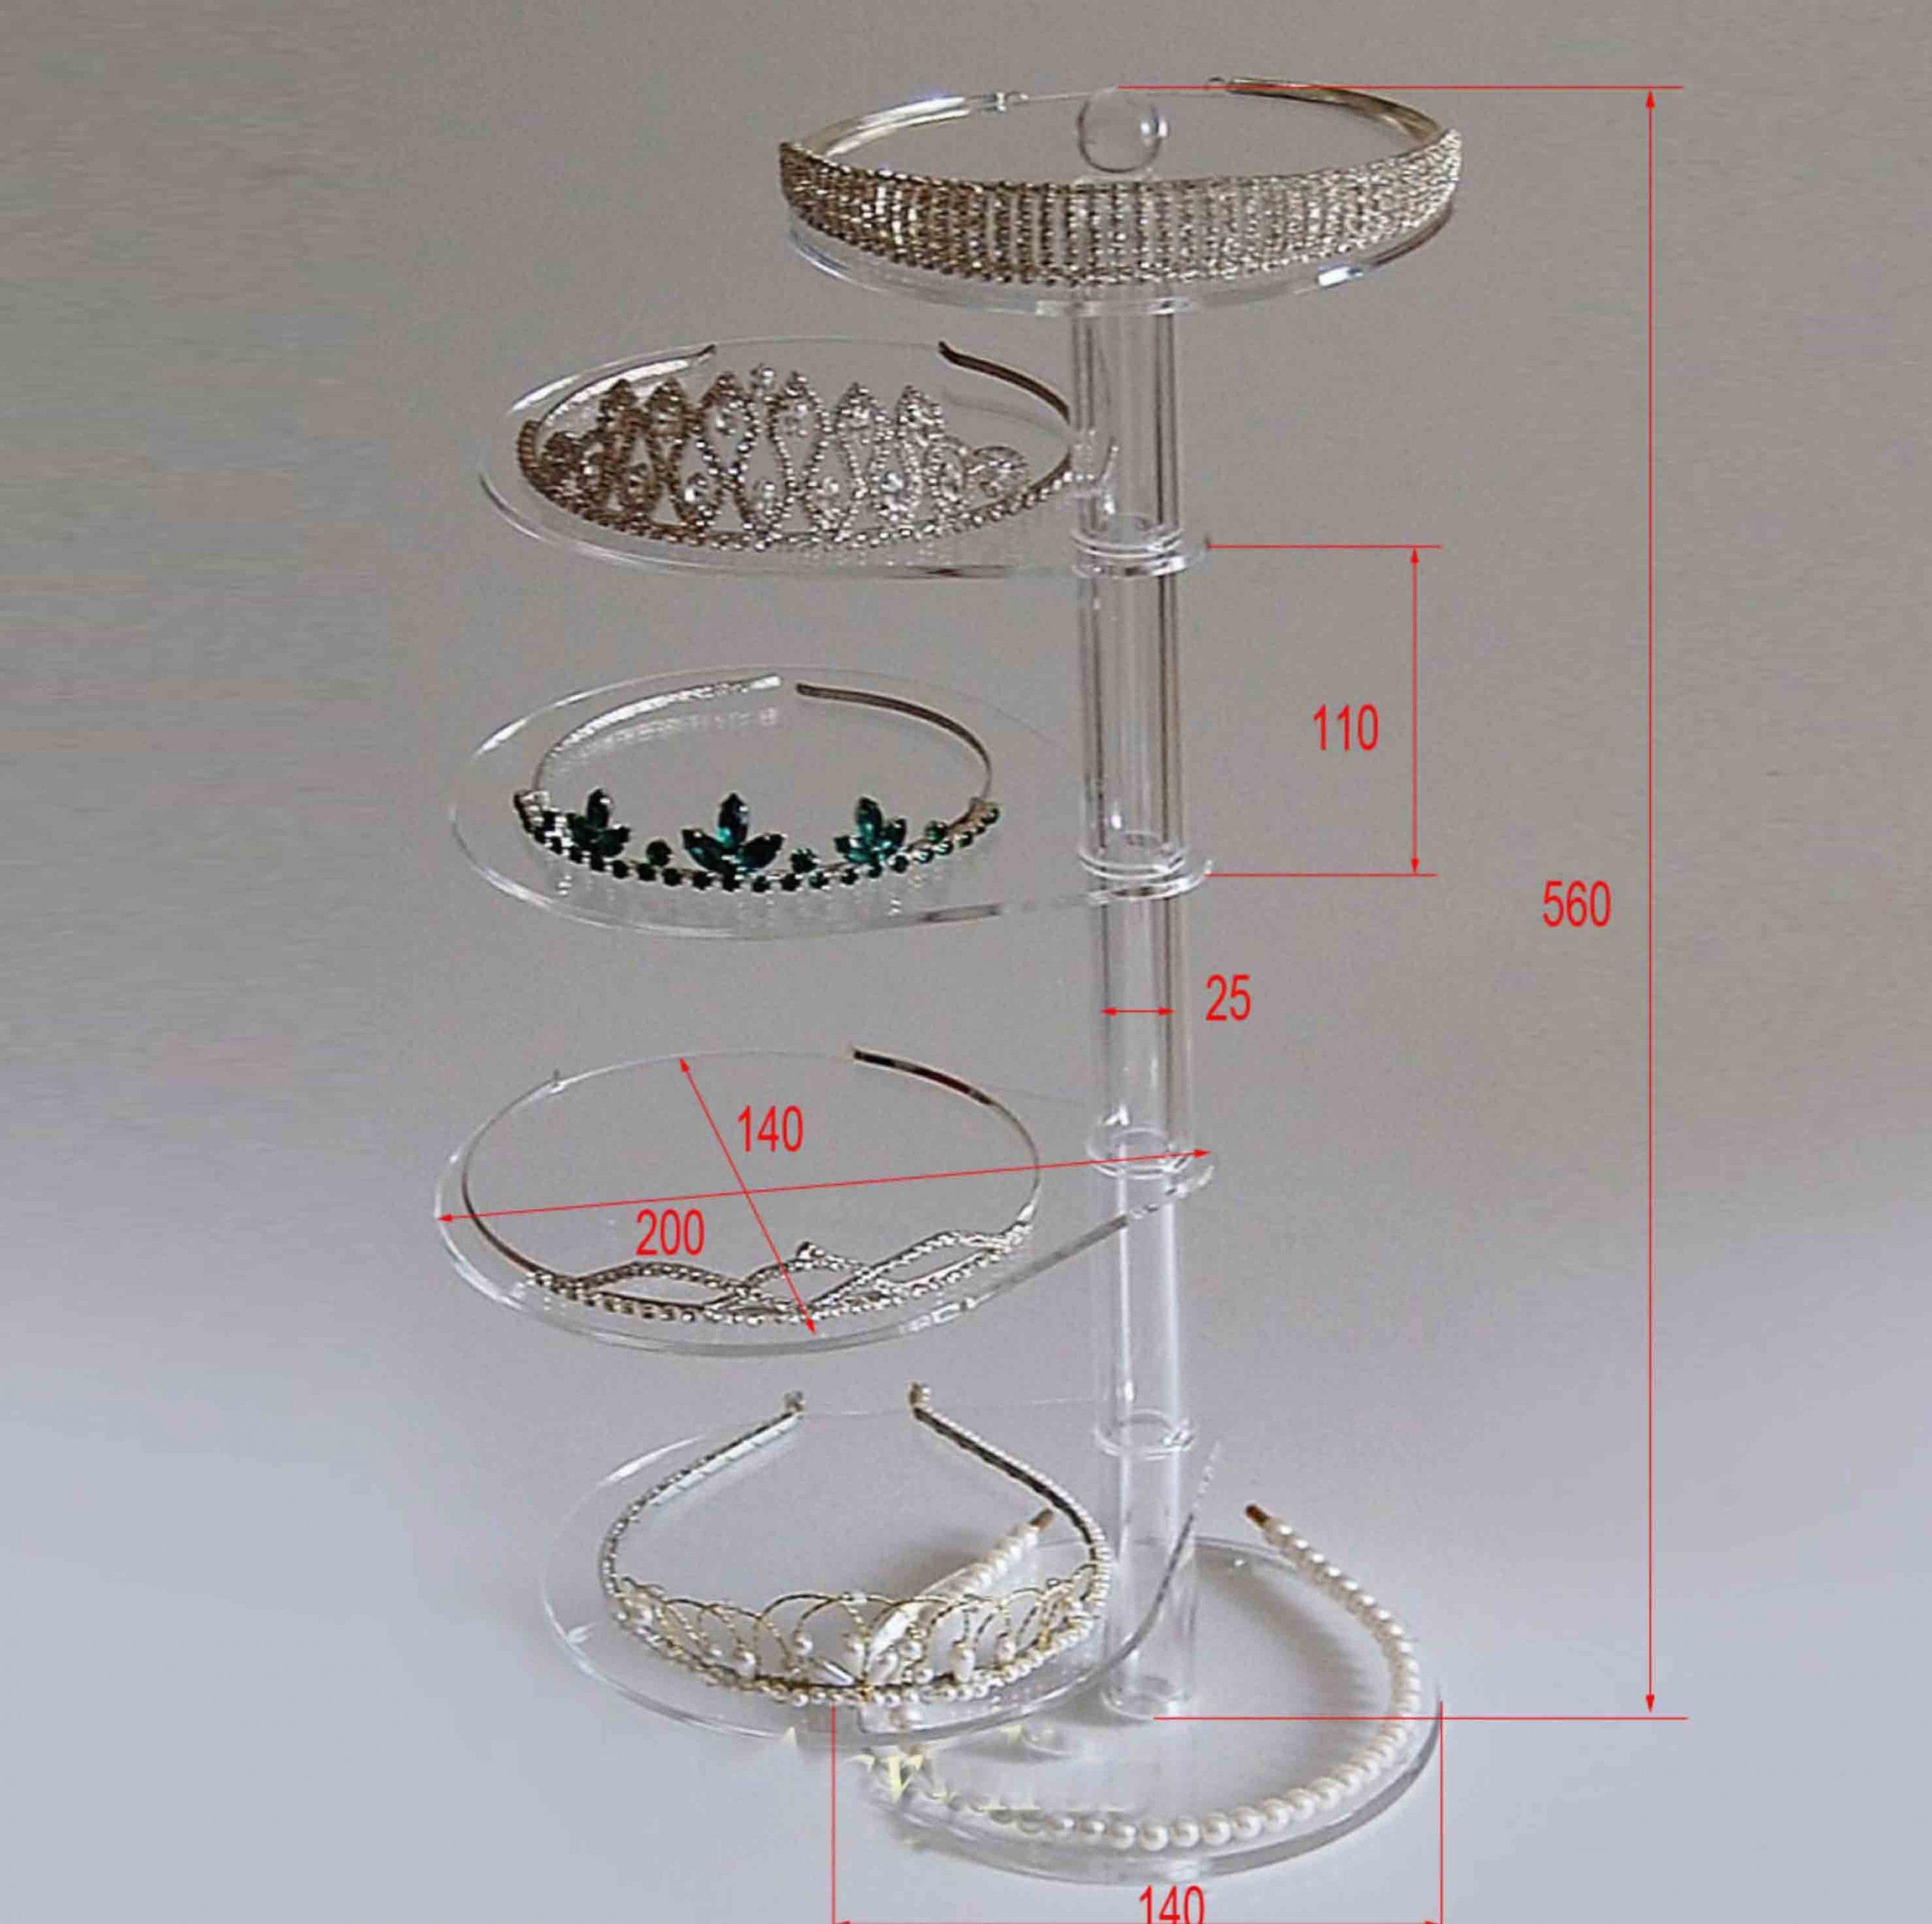 Revolving Acrylic Jewelry Display Table Kits earring display tray